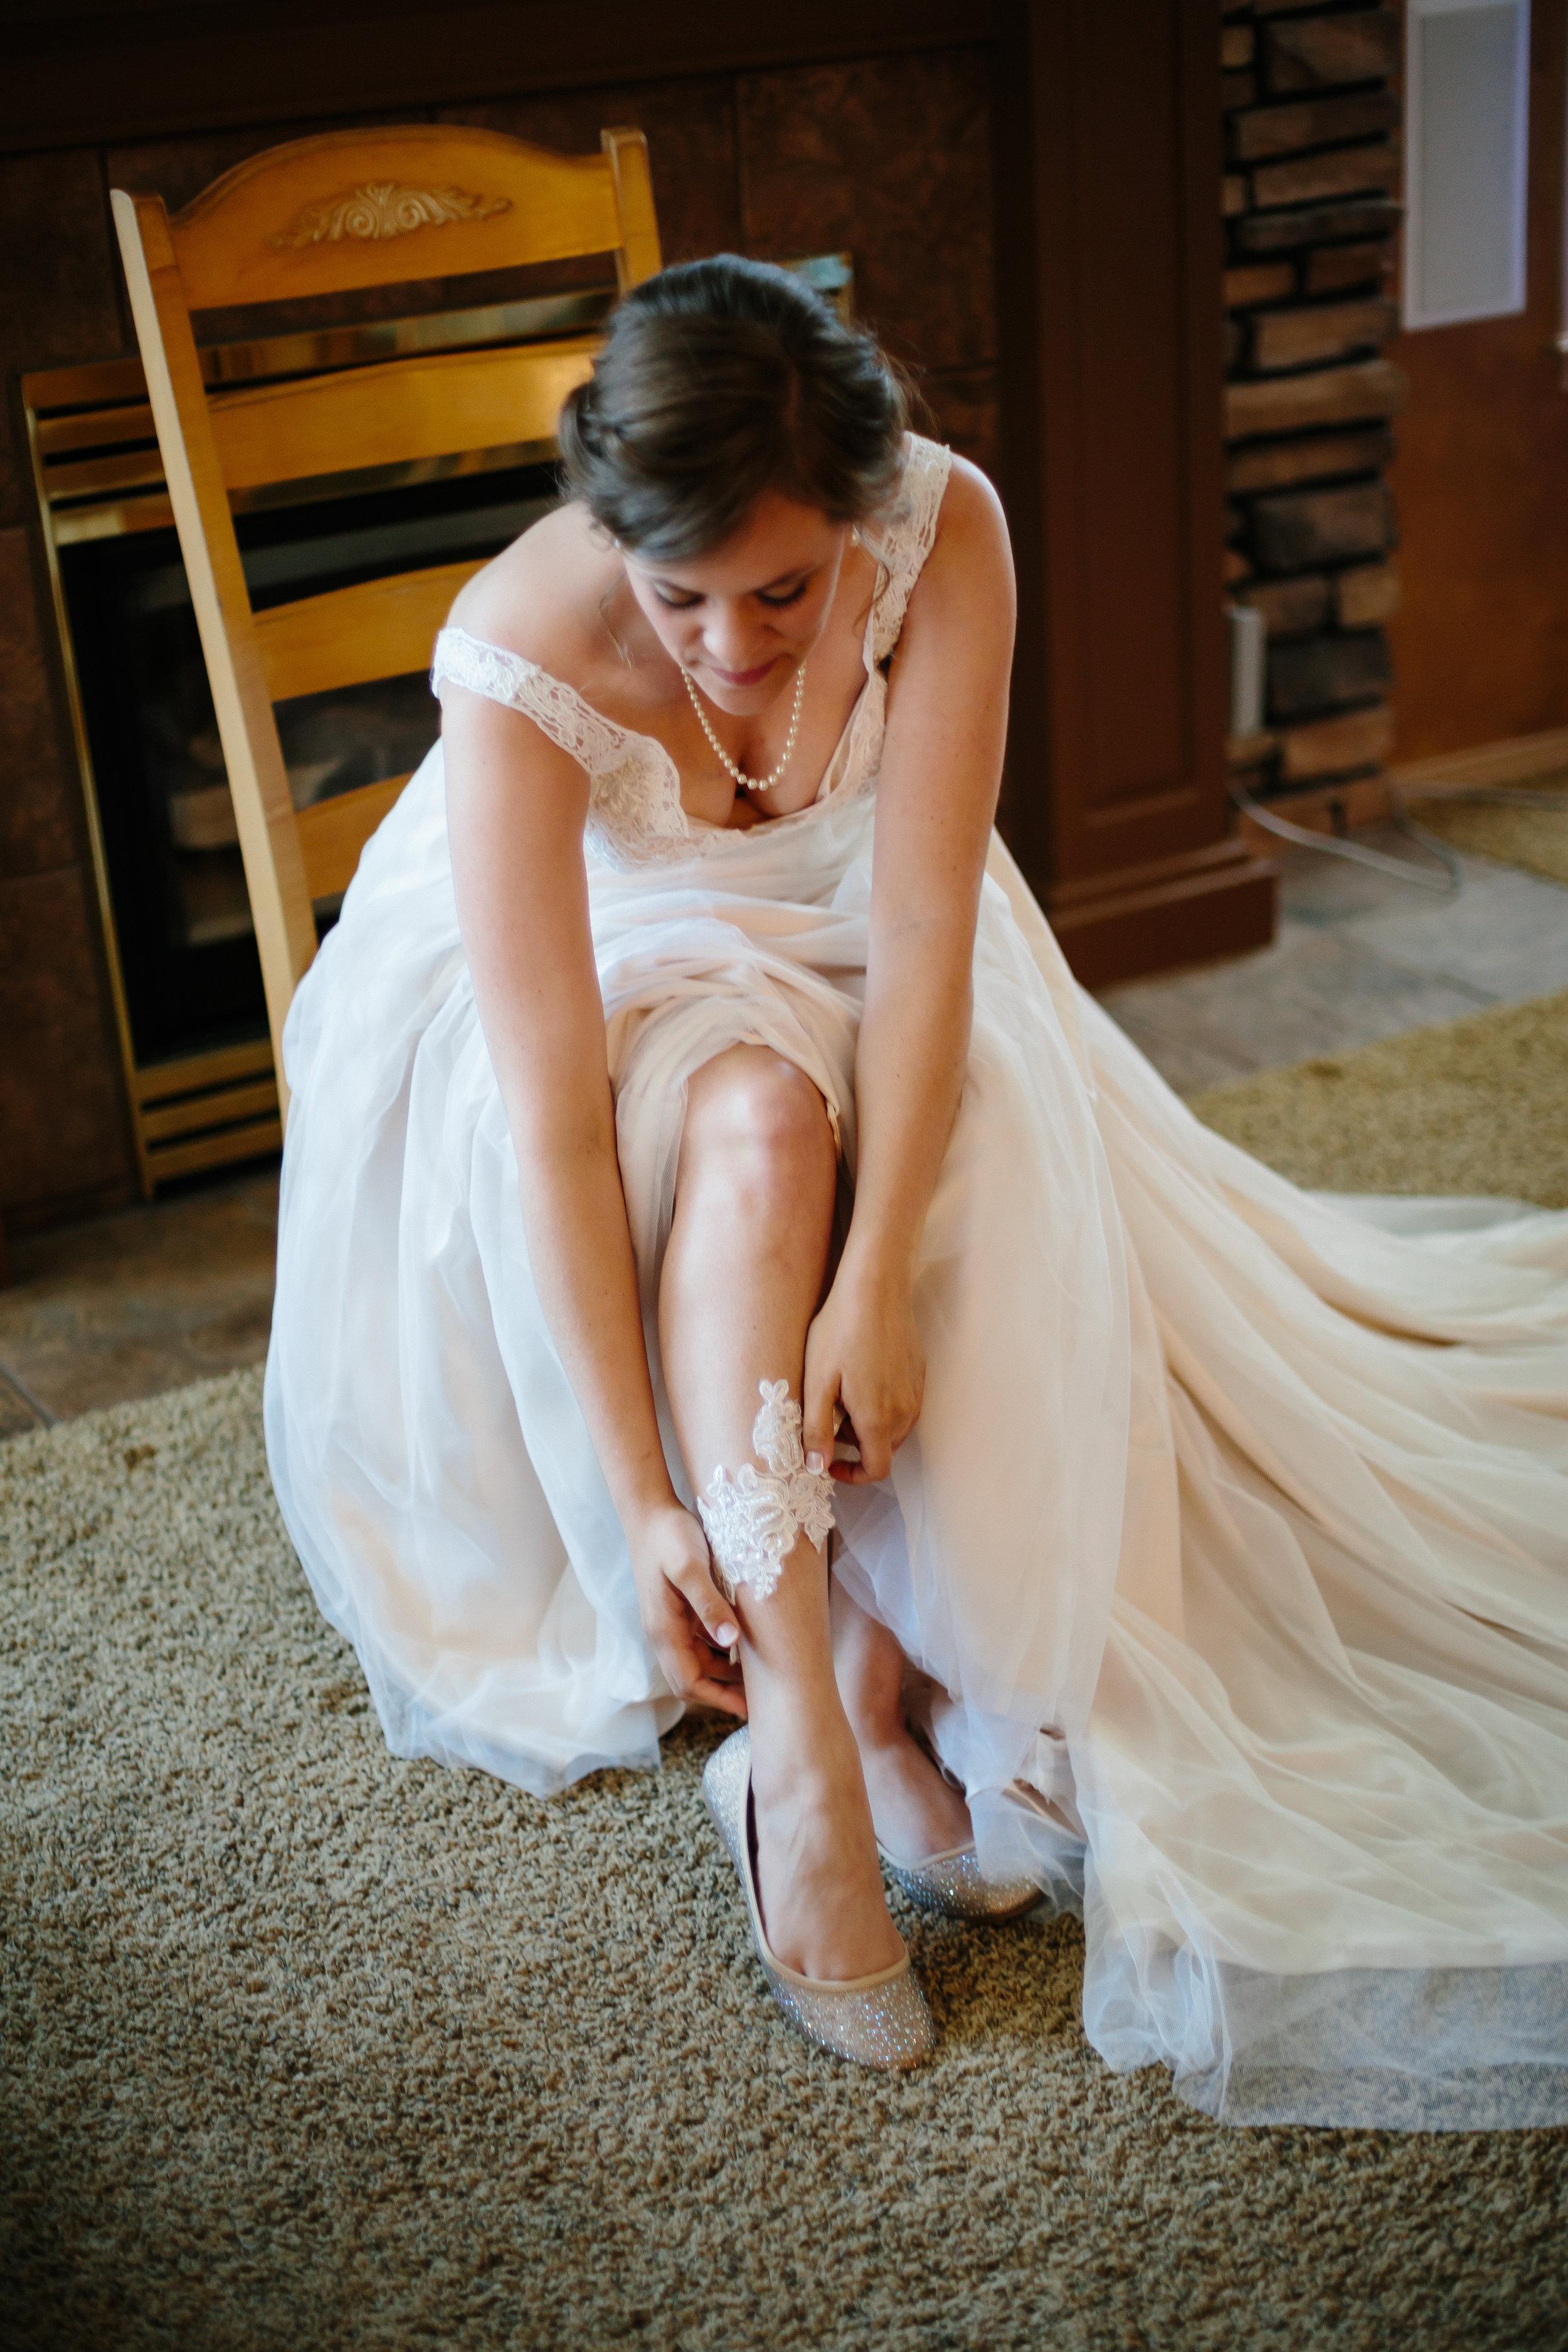 Jordan & Shantel Married - Idaho - Corrie Mick Photography-44.jpg